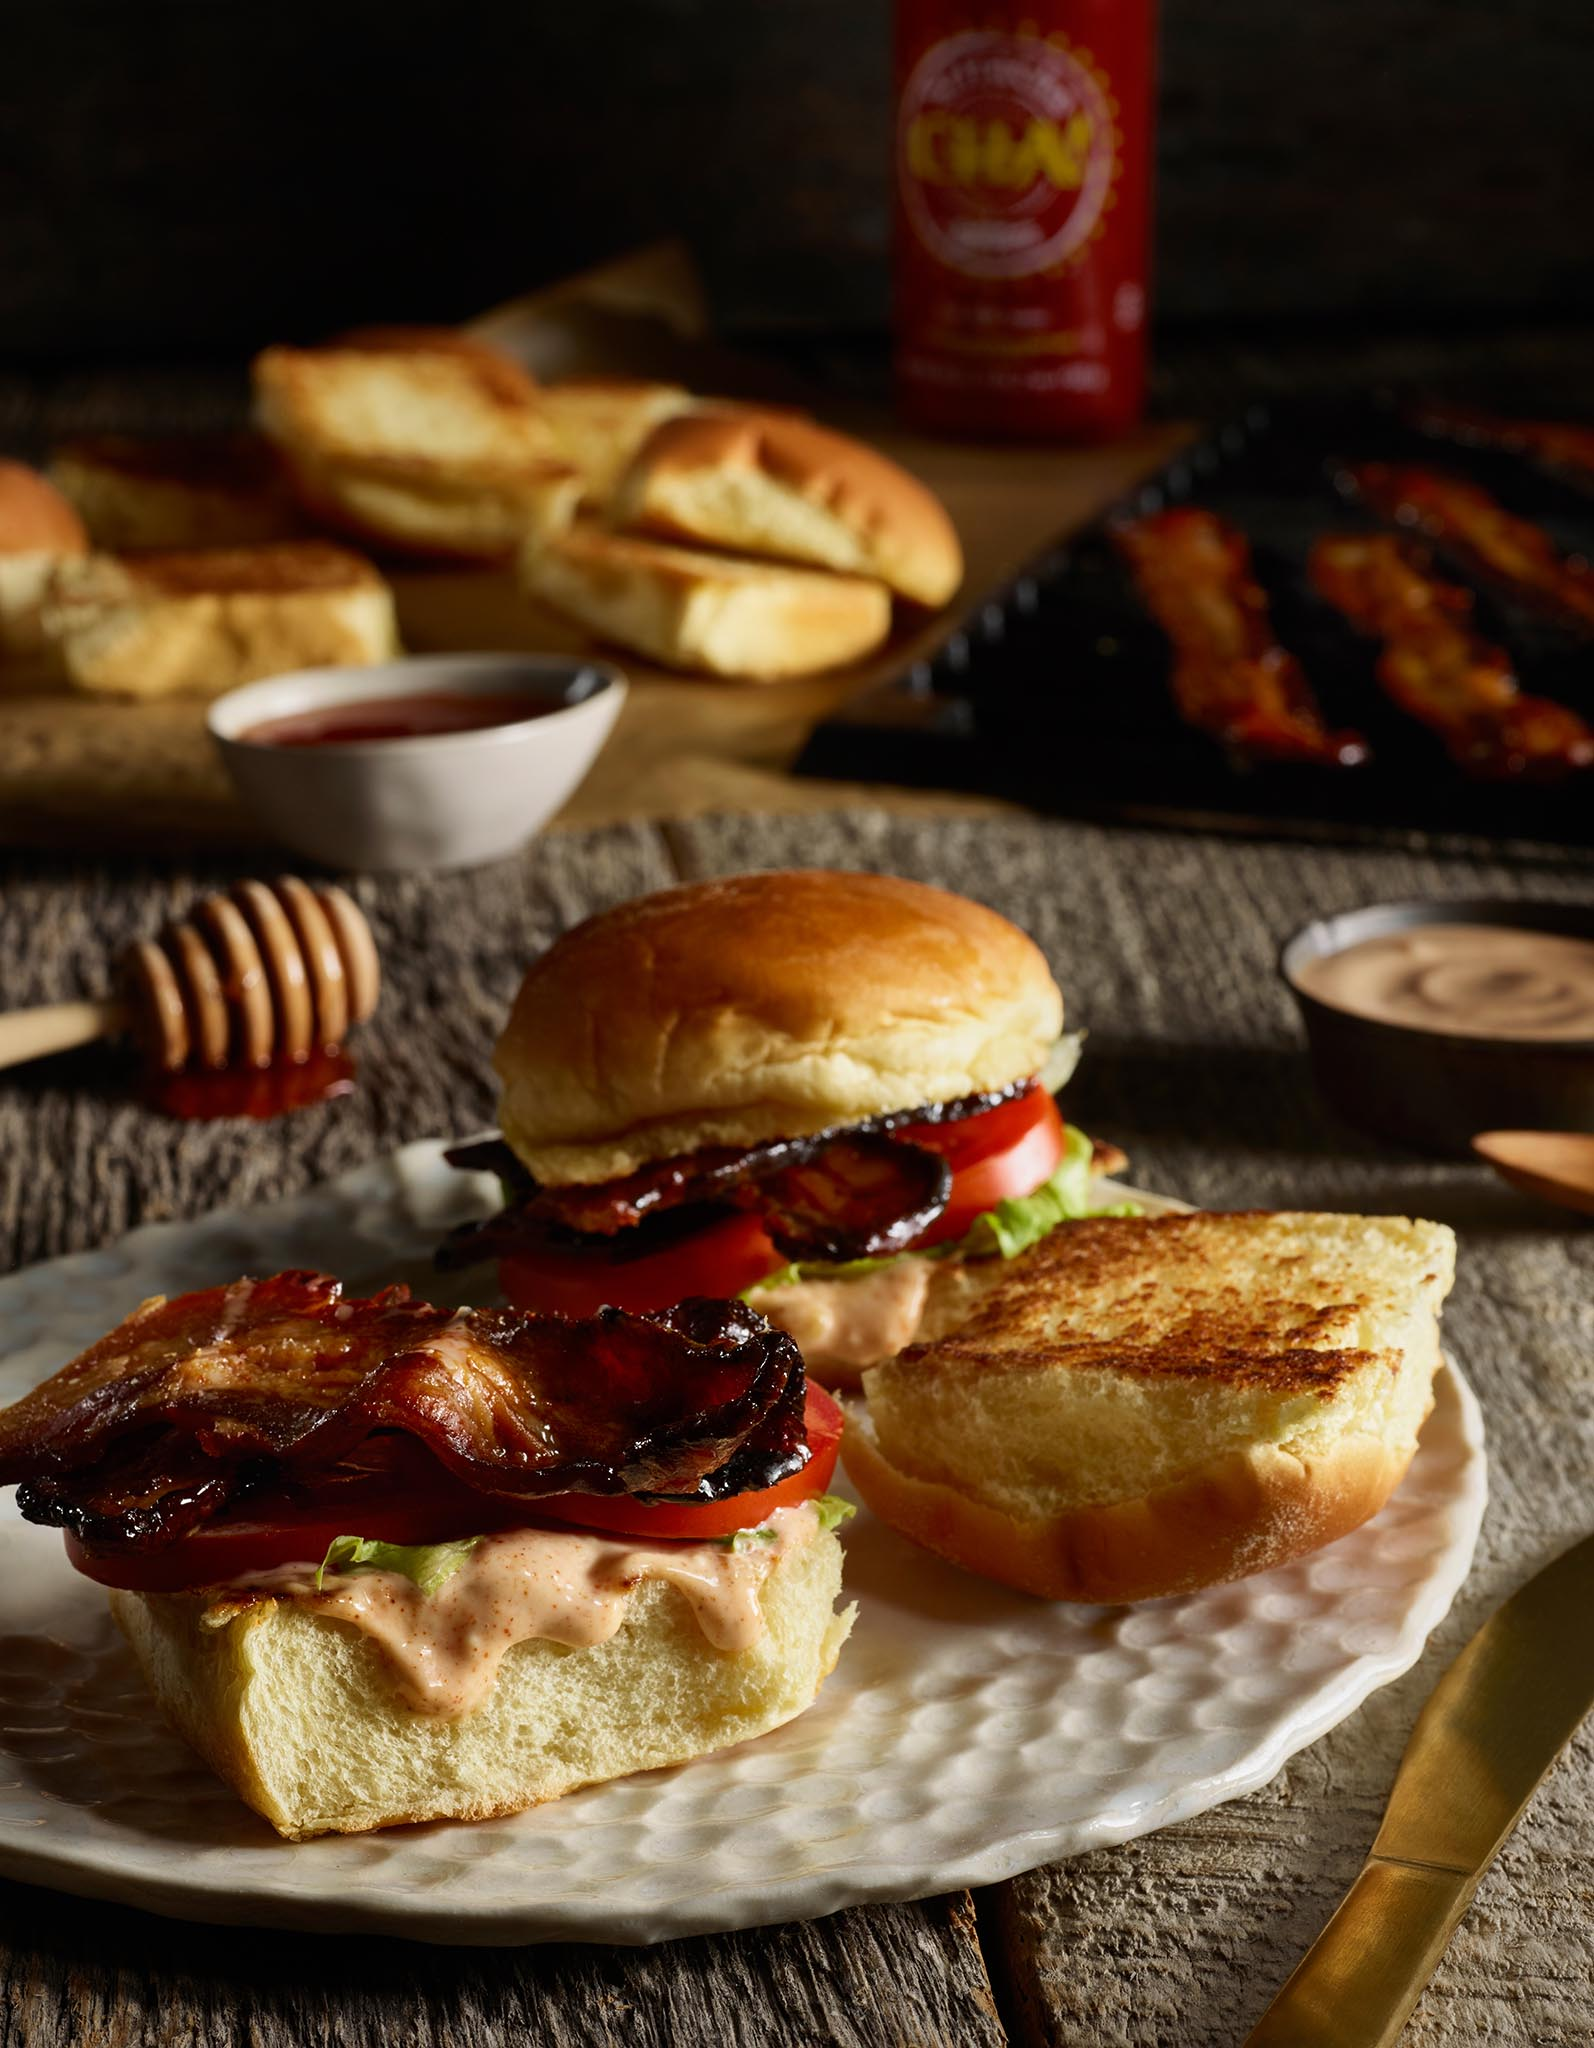 TexasPete_bacon-blt.jpg